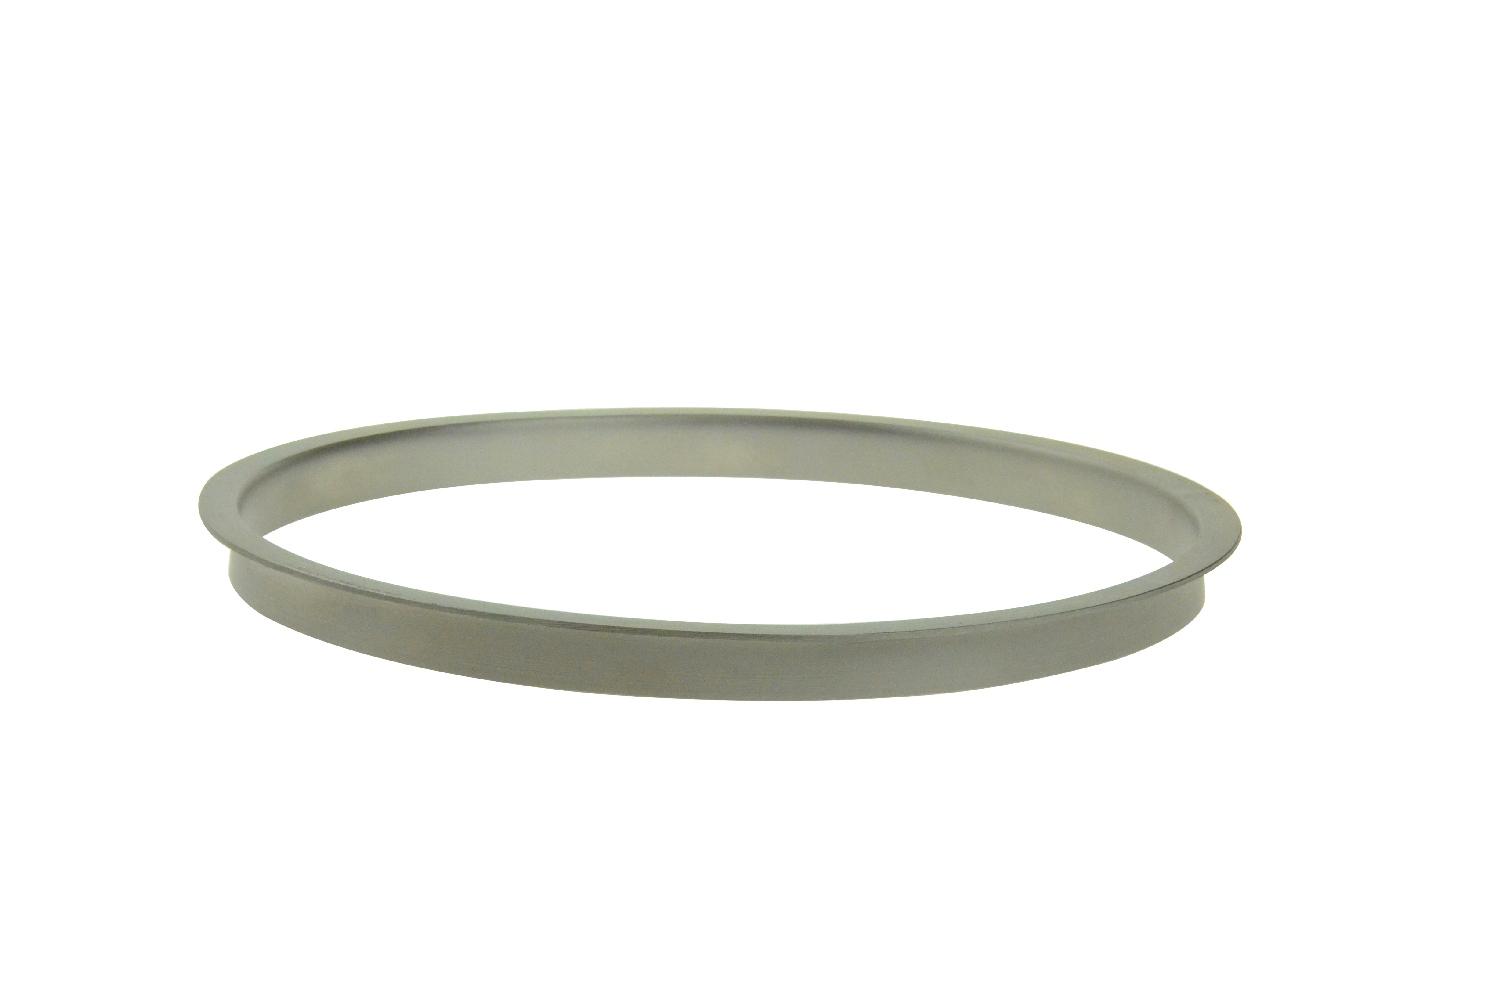 jacob-accessories-basic-adapter-flange-tfl15mm